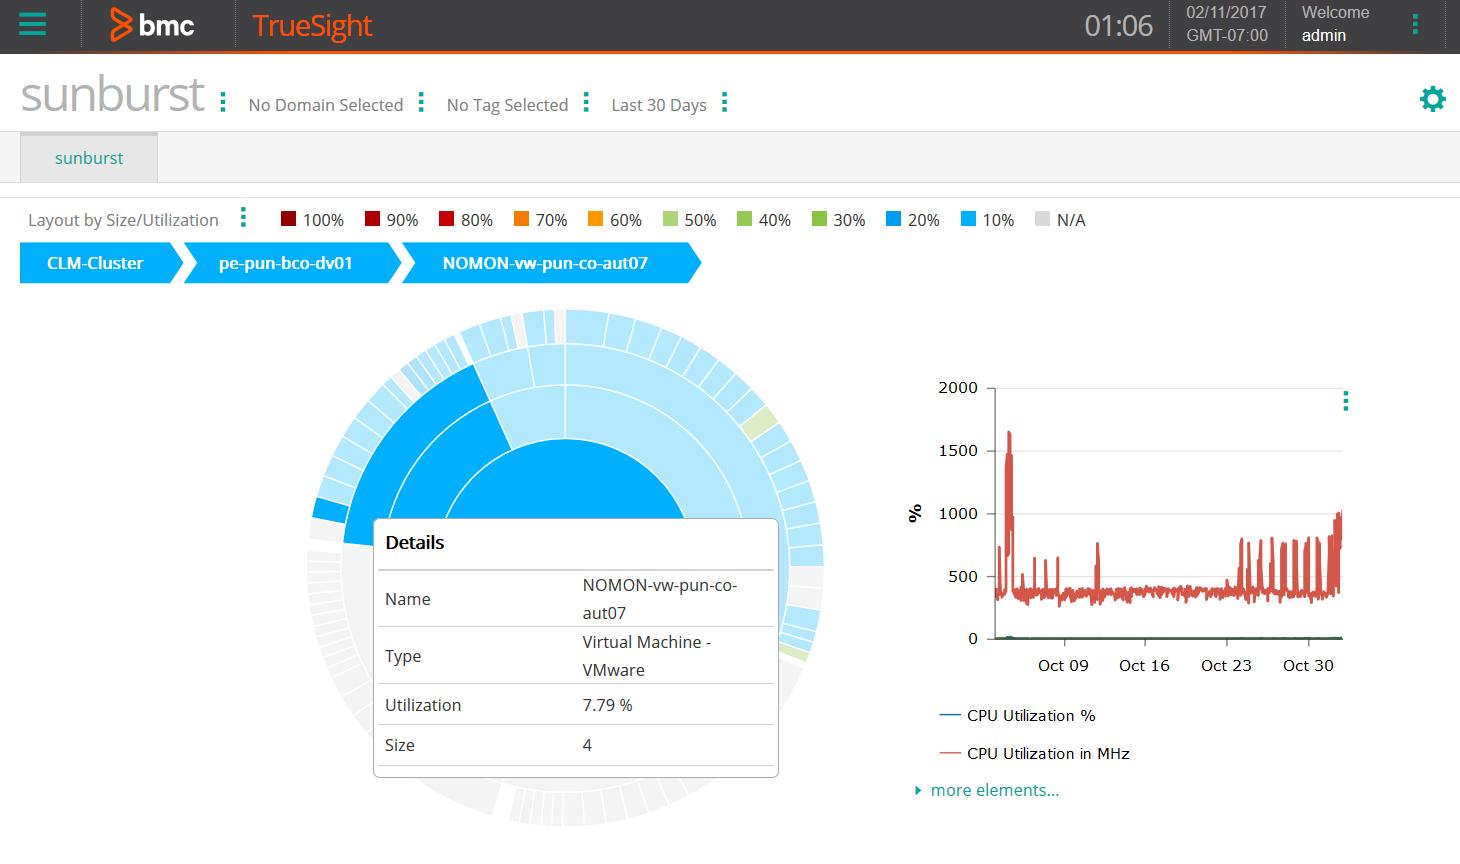 11 3 01 enhancements - Documentation for BMC TrueSight